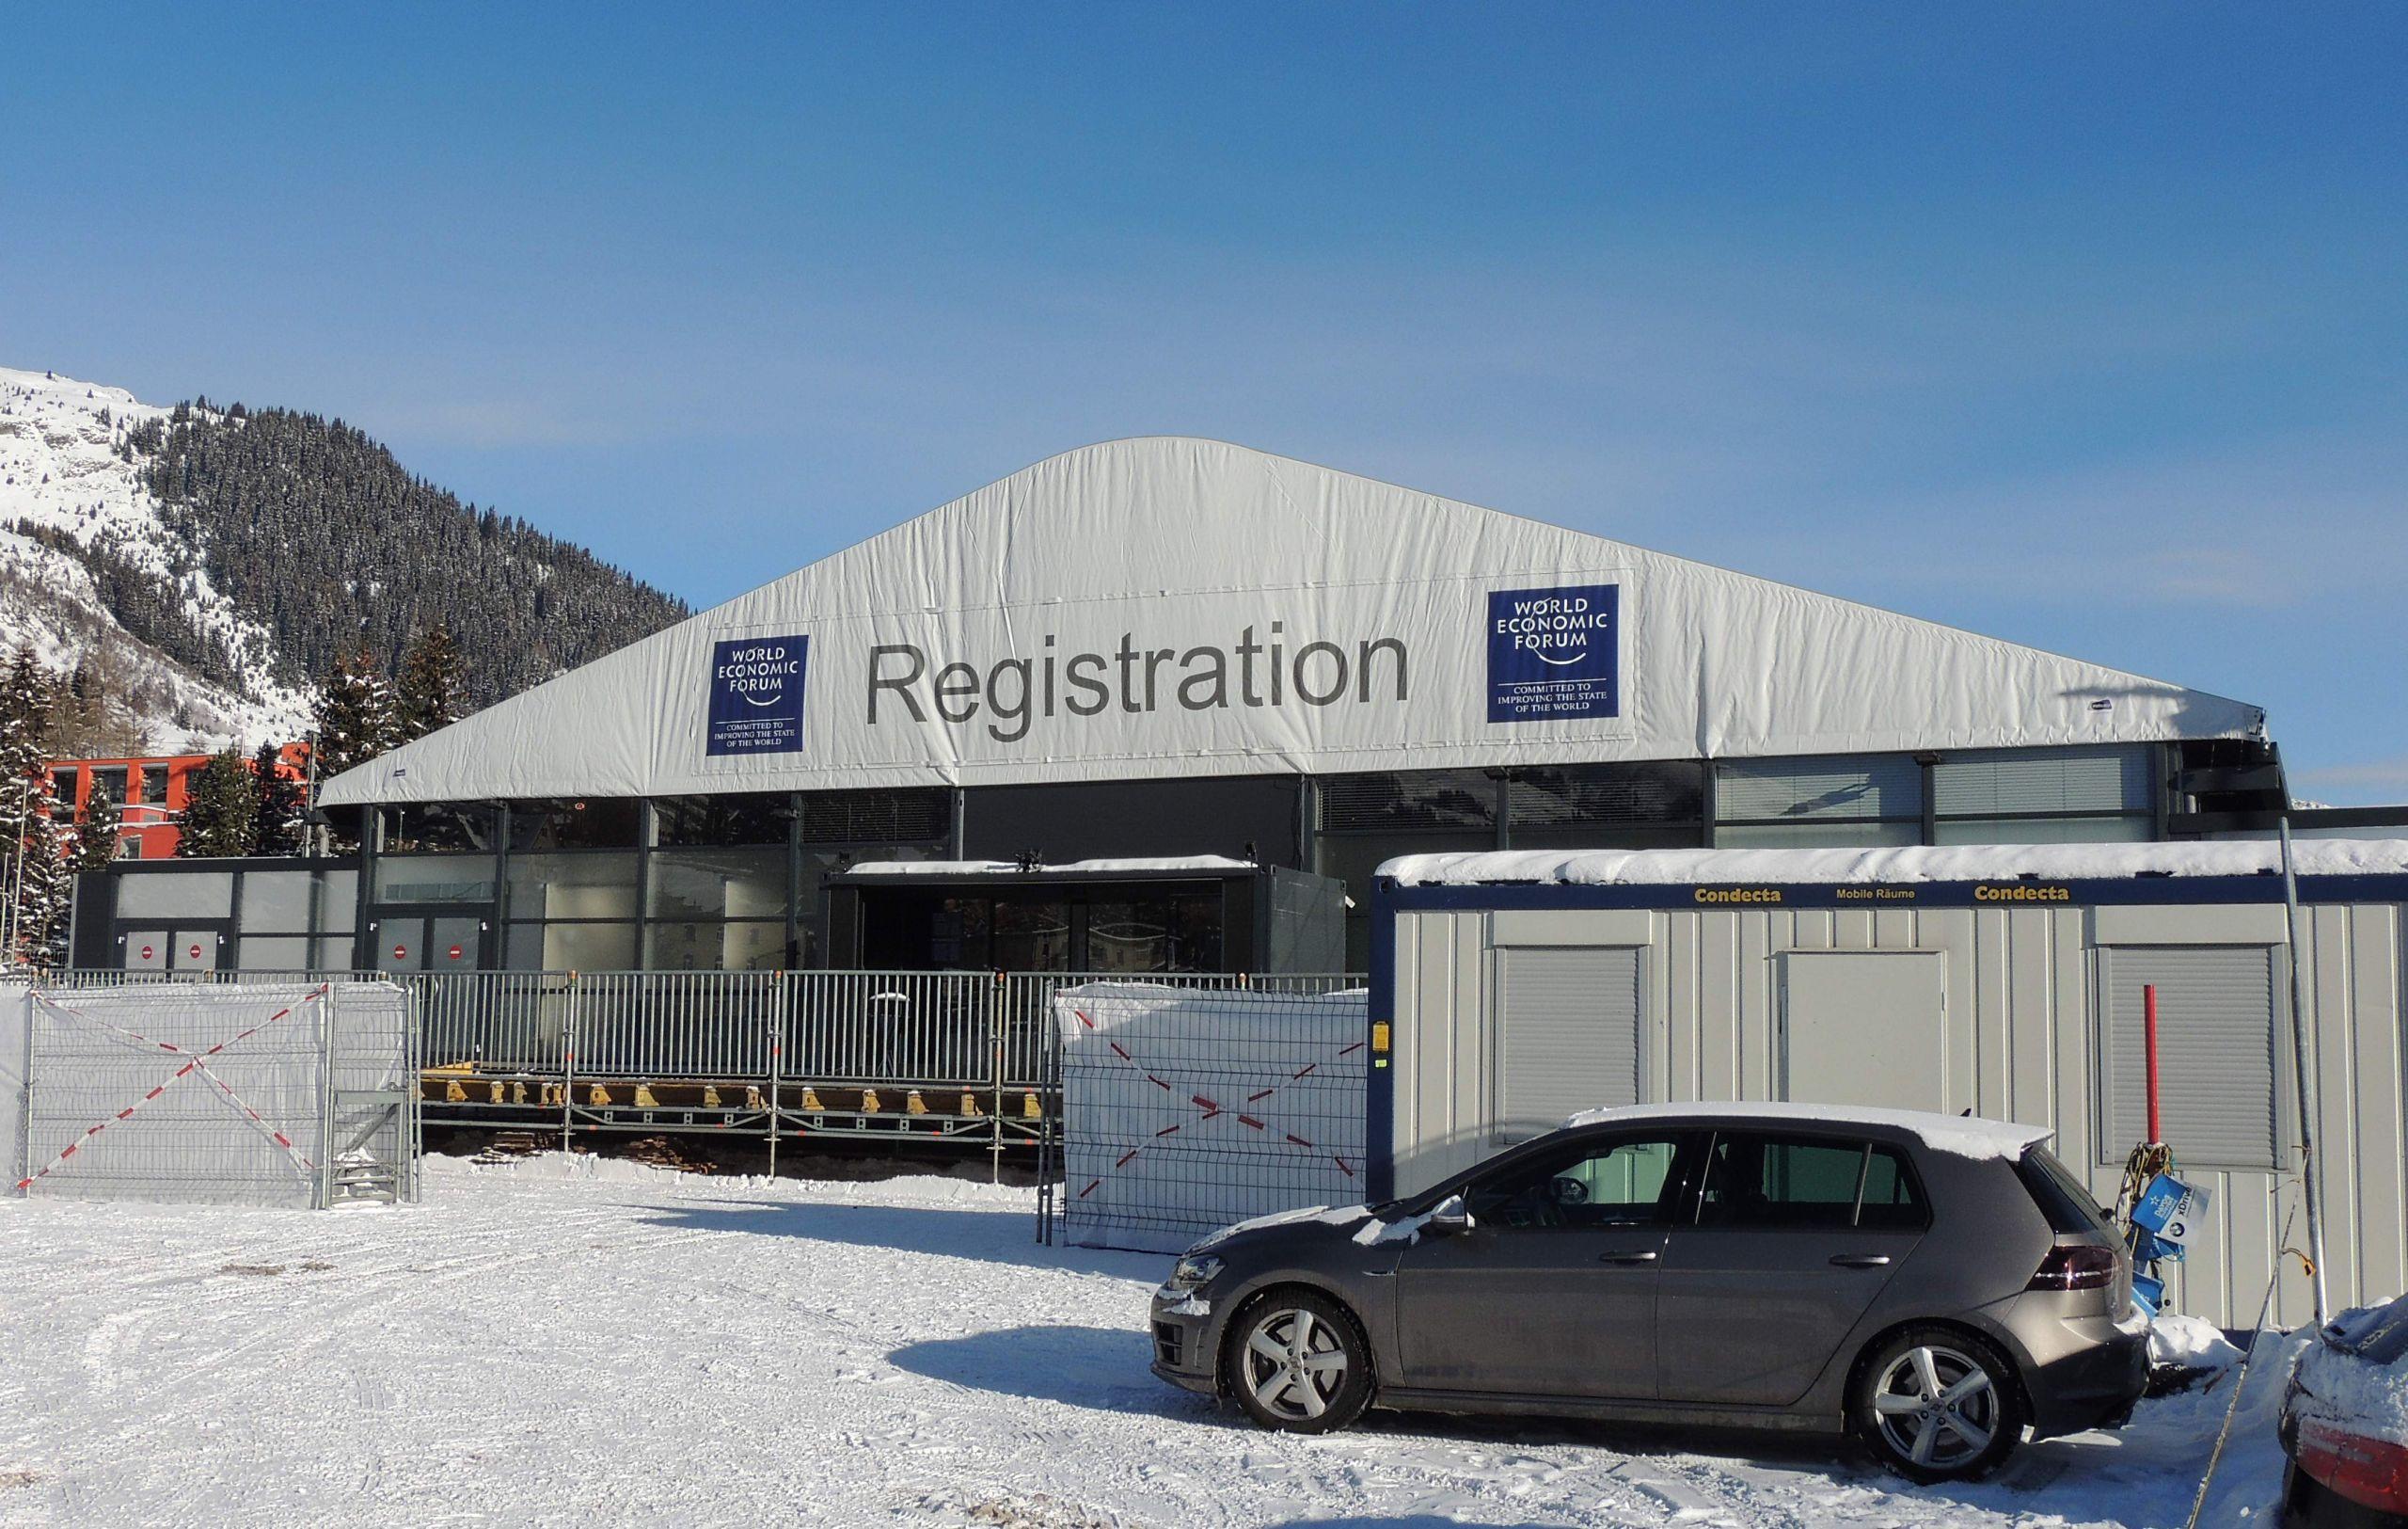 Mobil in Time WEF Registration DSCN5435 JPG